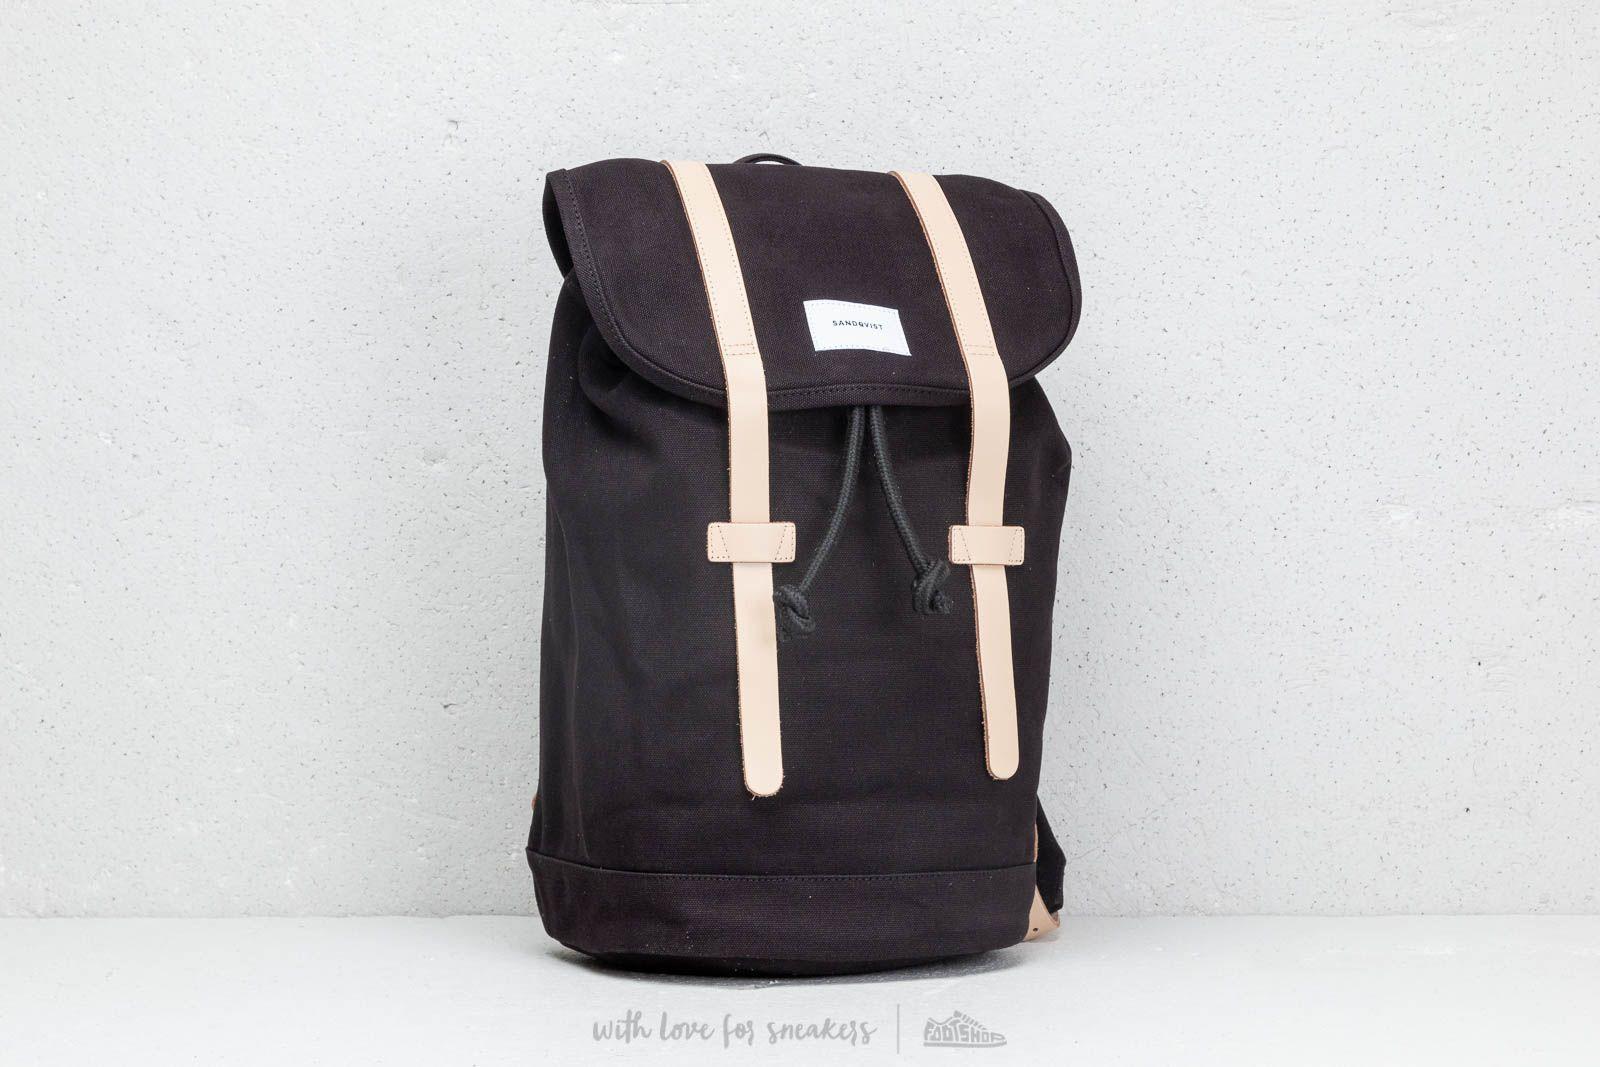 SANDQVIST Stig Backpack Black Natural za skvelú cenu 94 € kúpite na Footshop.sk